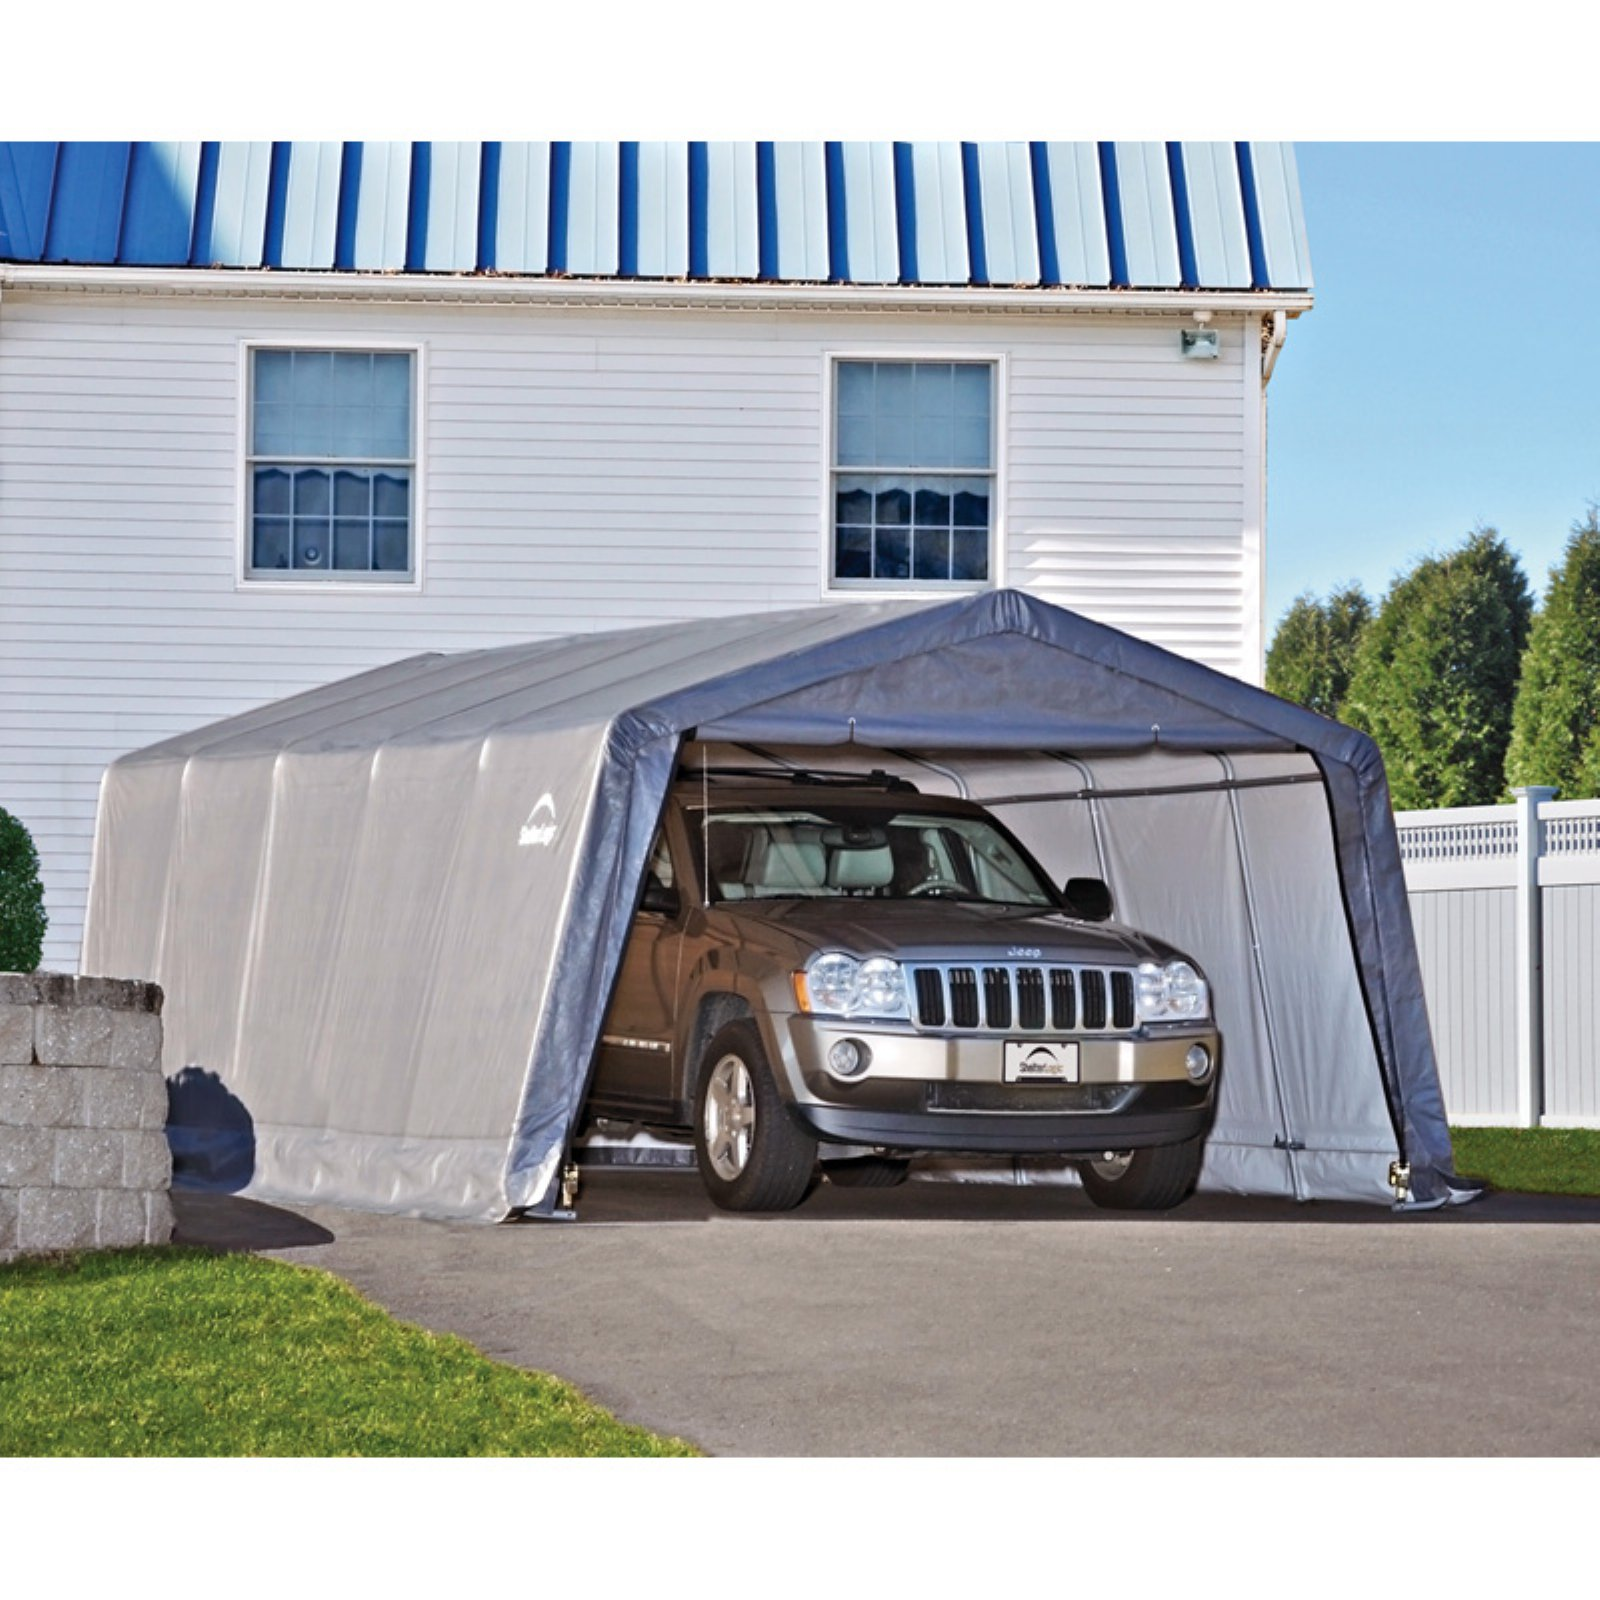 Garage-in-a-Box 12' x 20' x 8' Peak Style Instant Garage, Gray by ShelterLogic